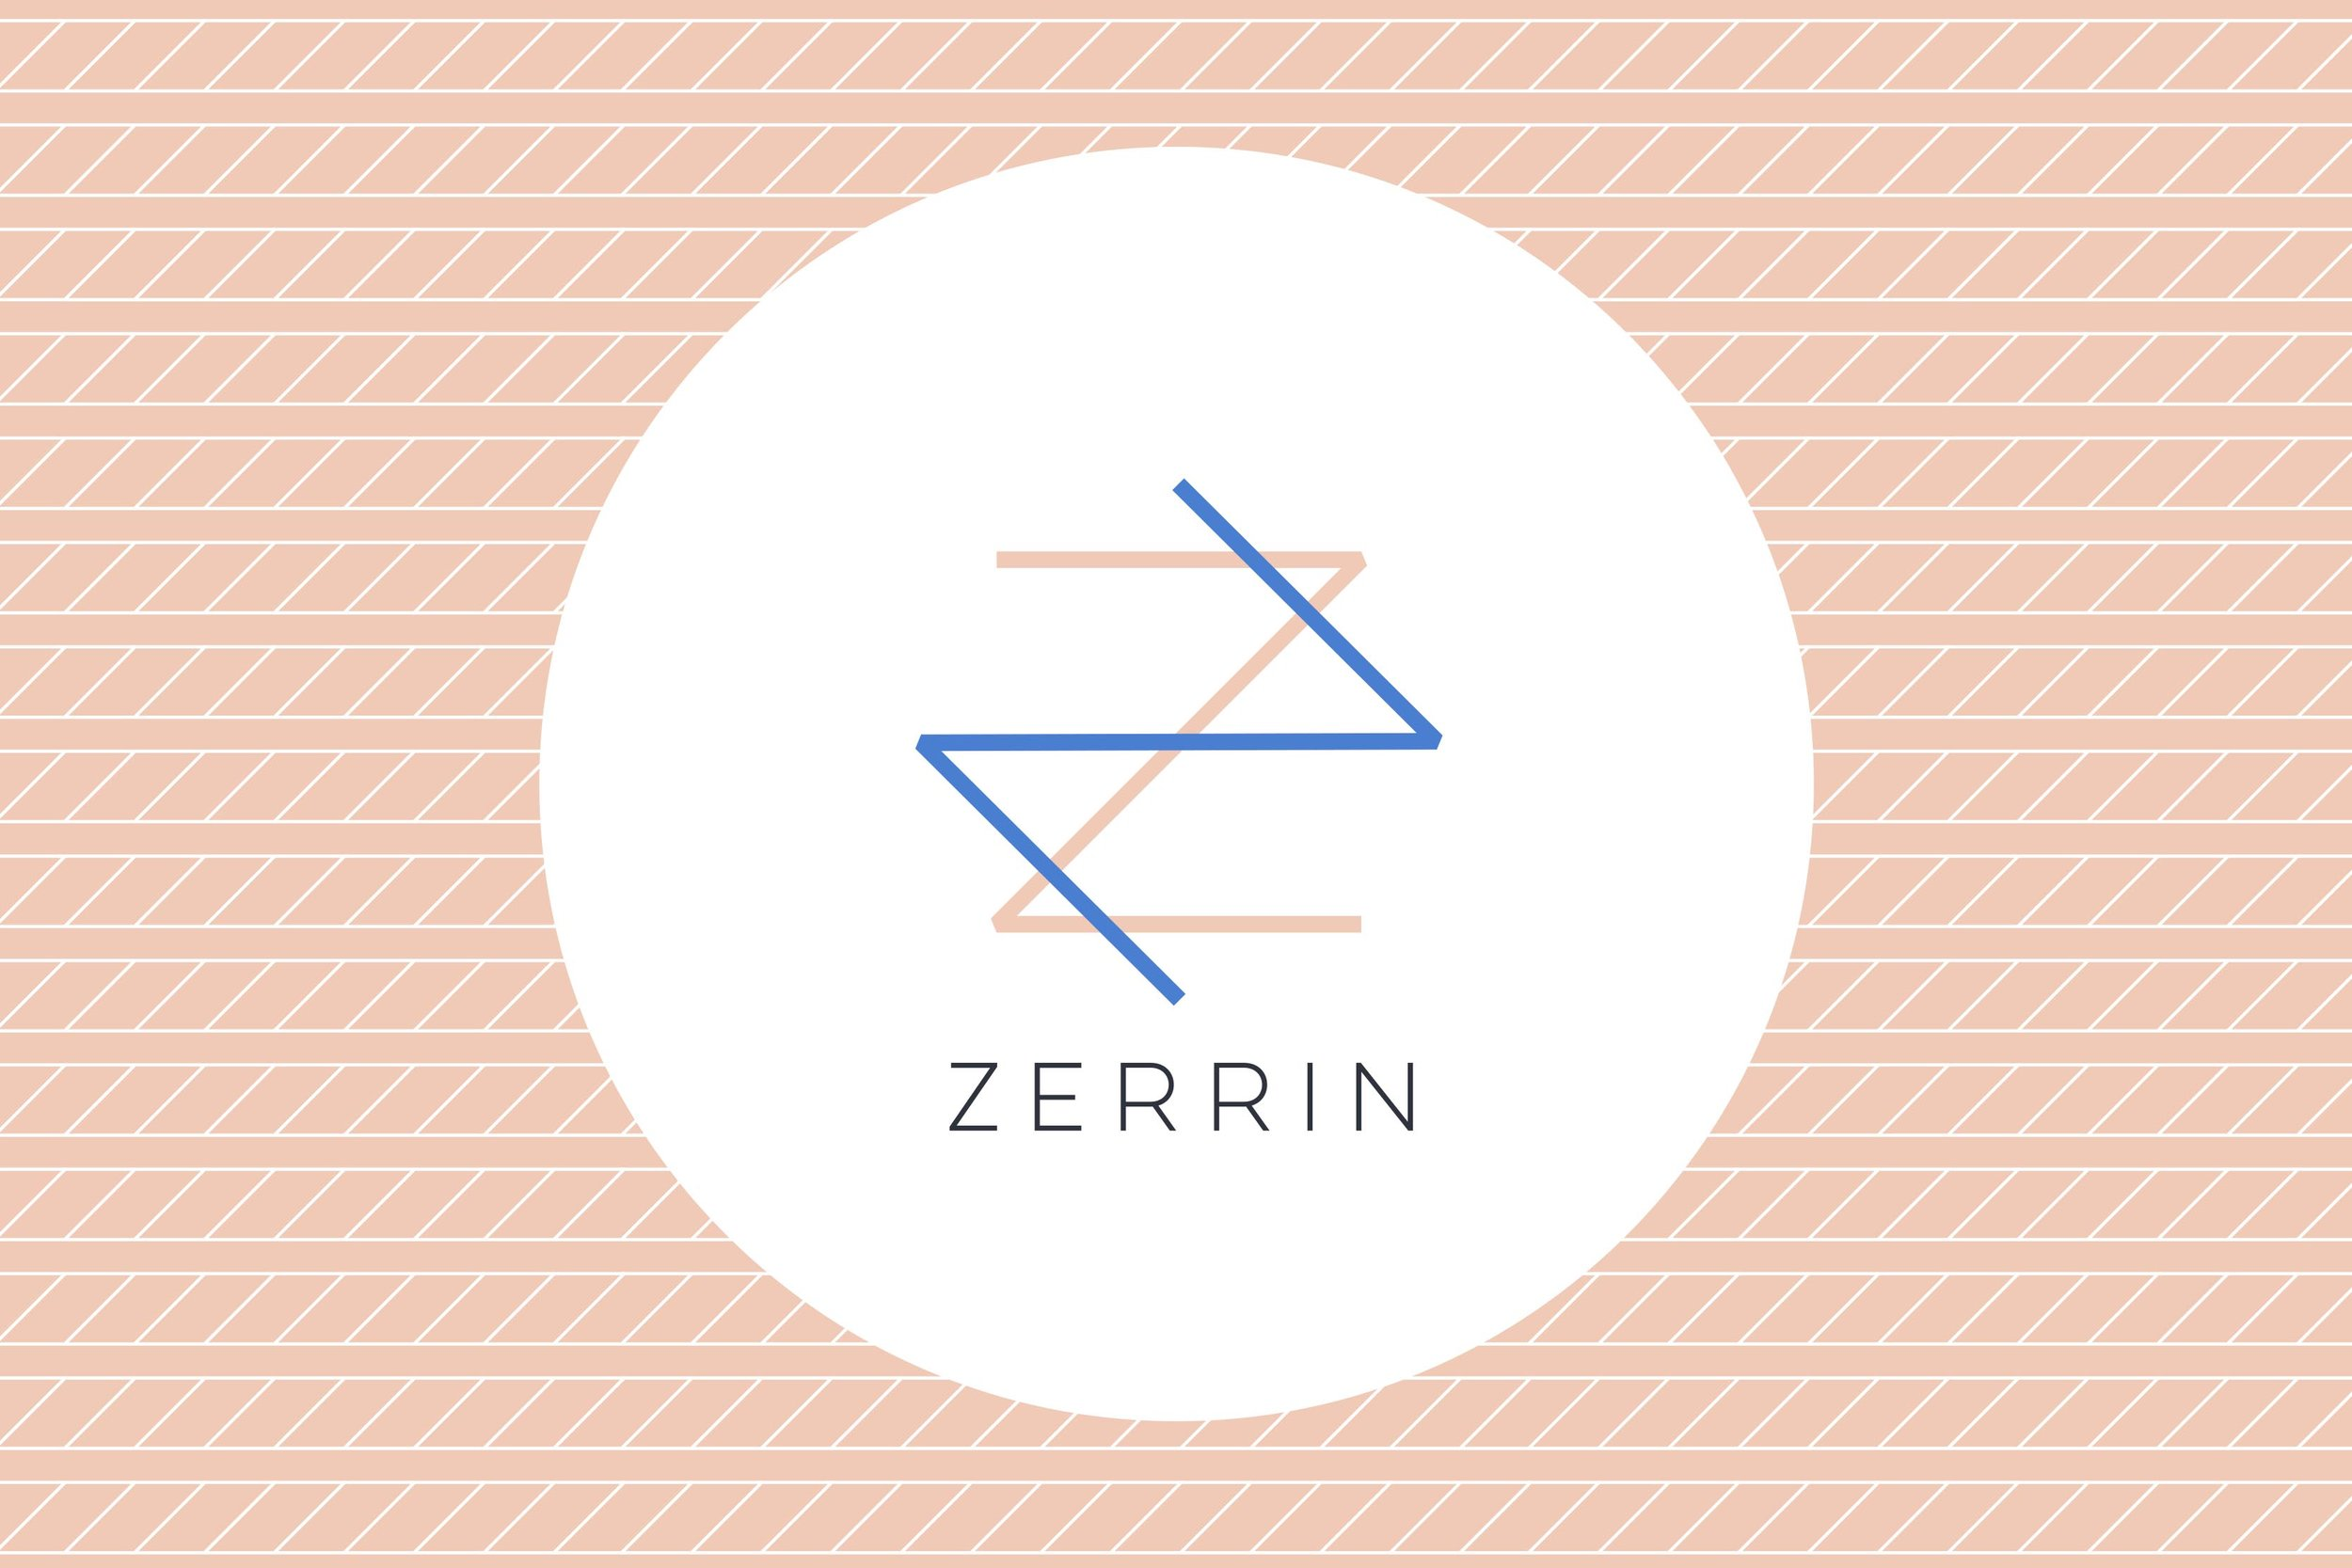 Zerrin+Big+Logo+mockup.jpg